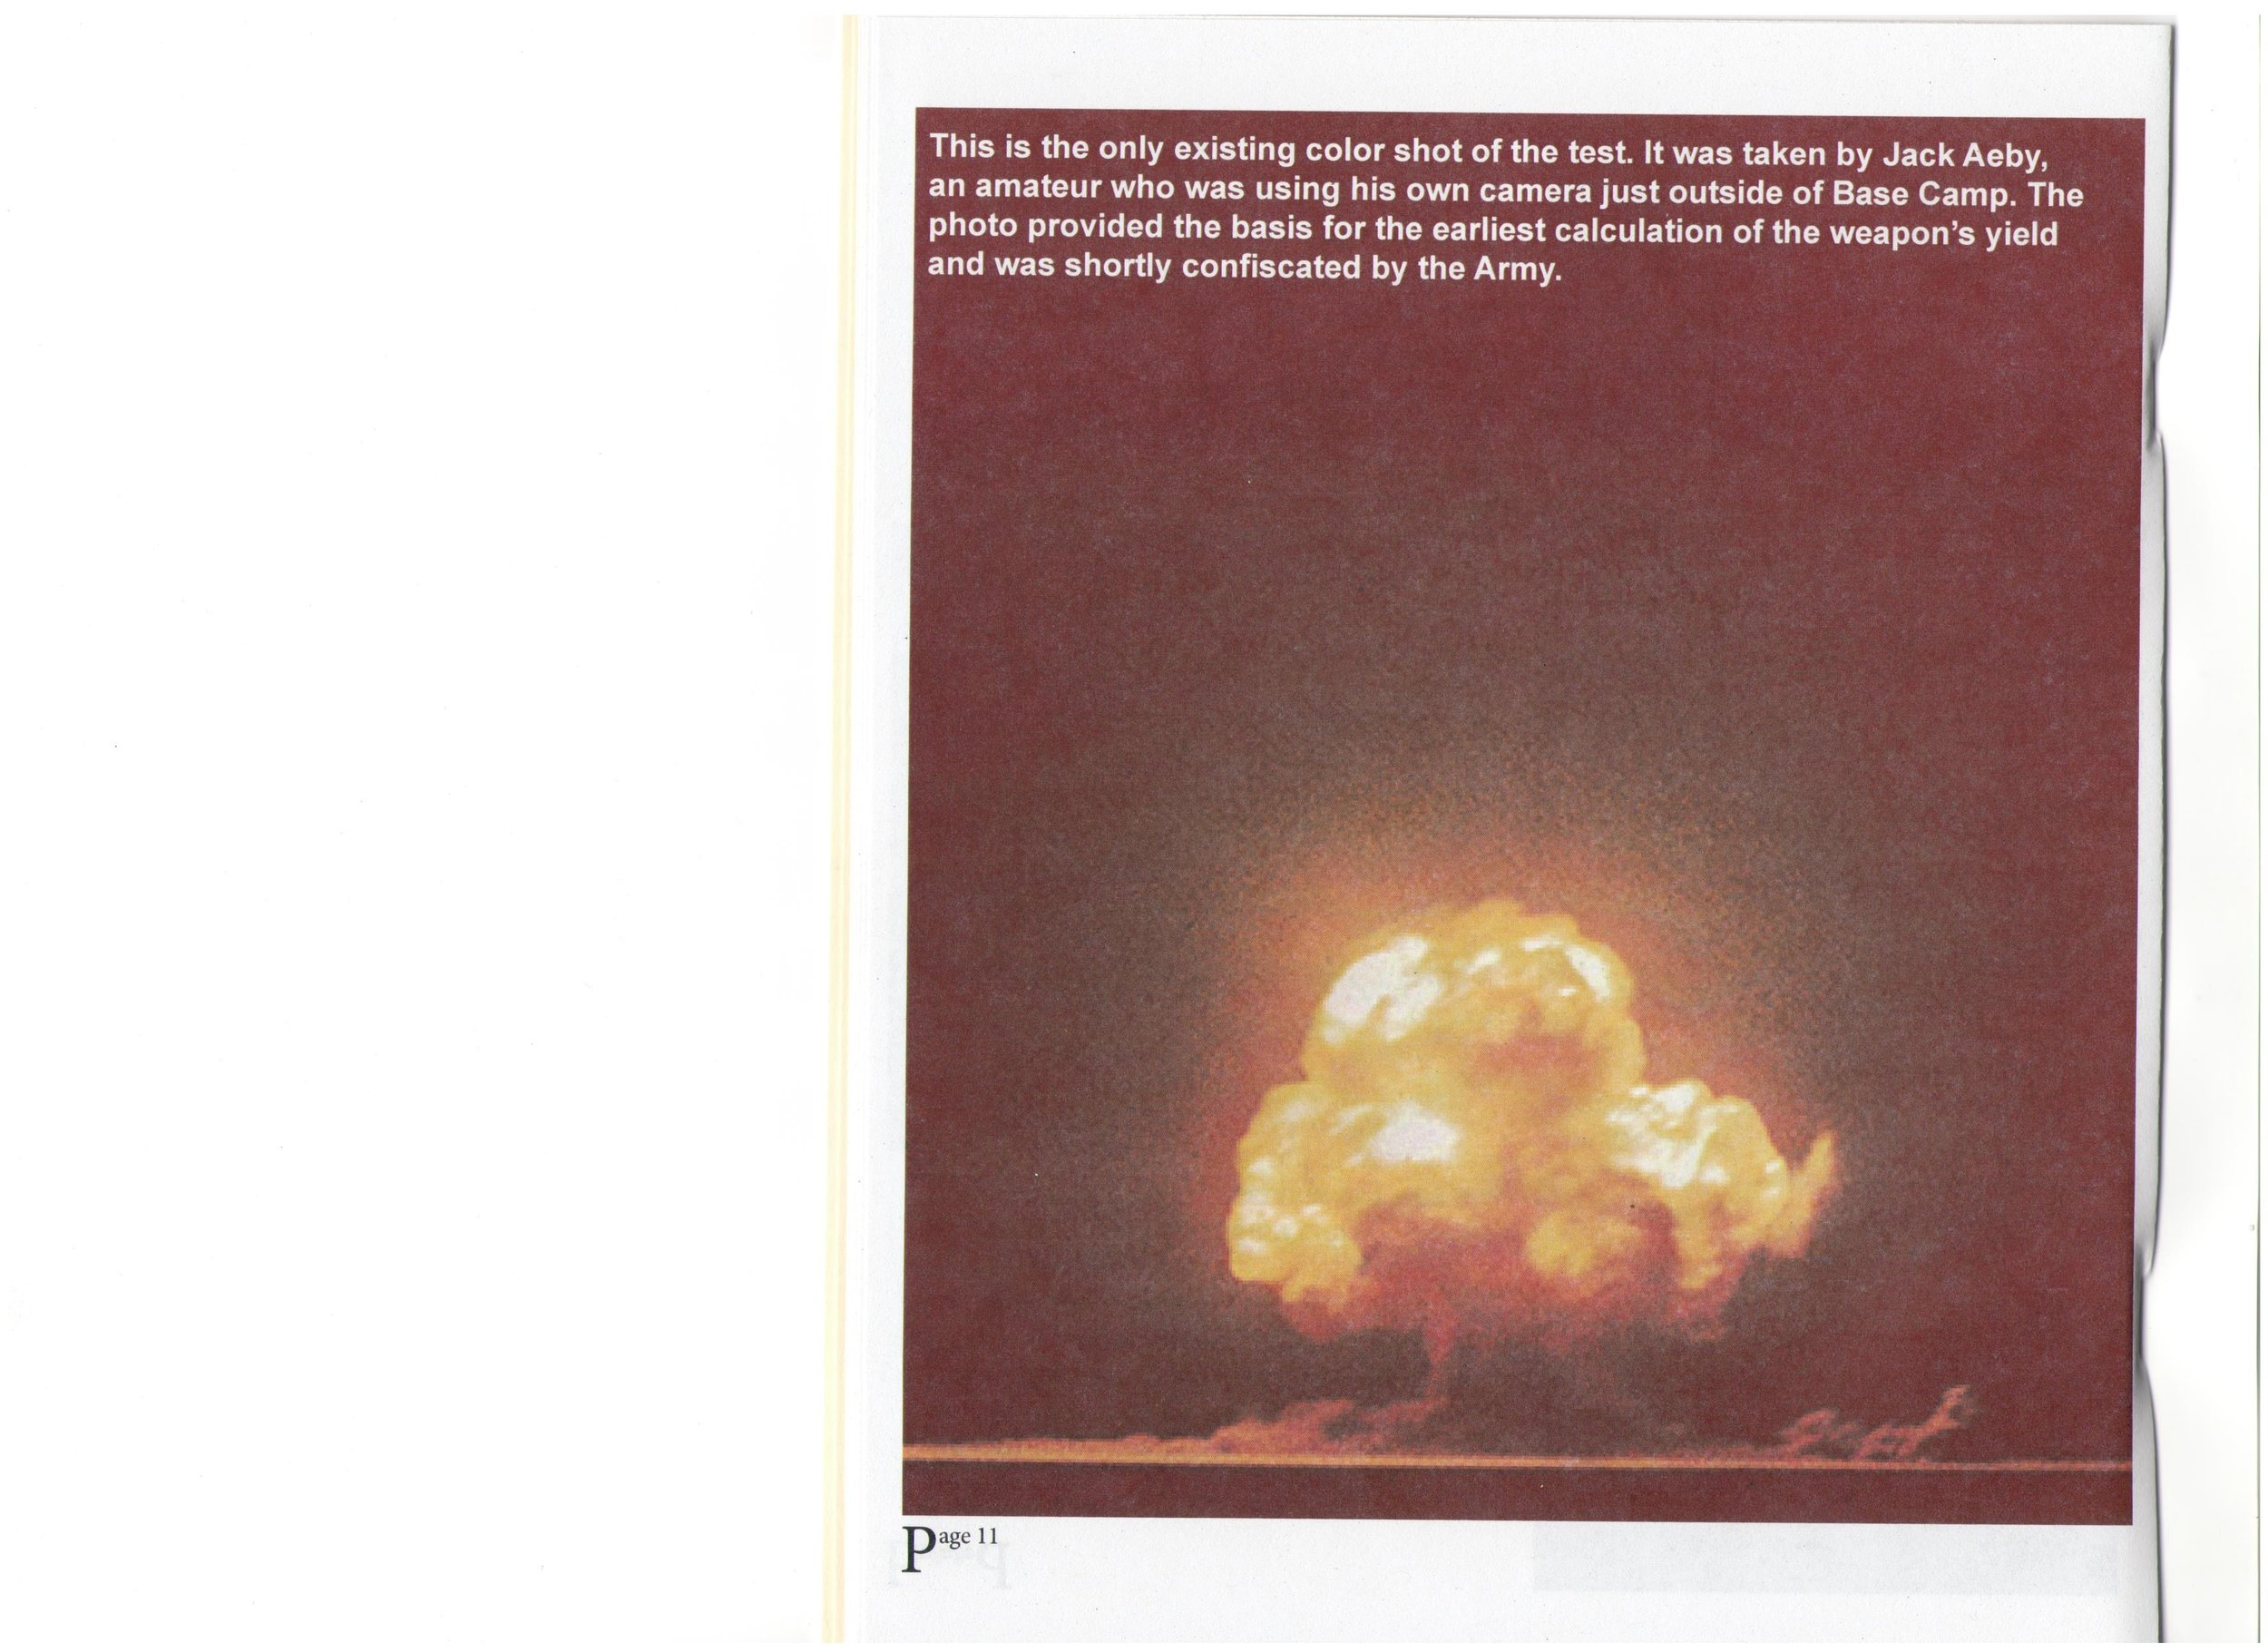 Trinity pg 12 001.jpg